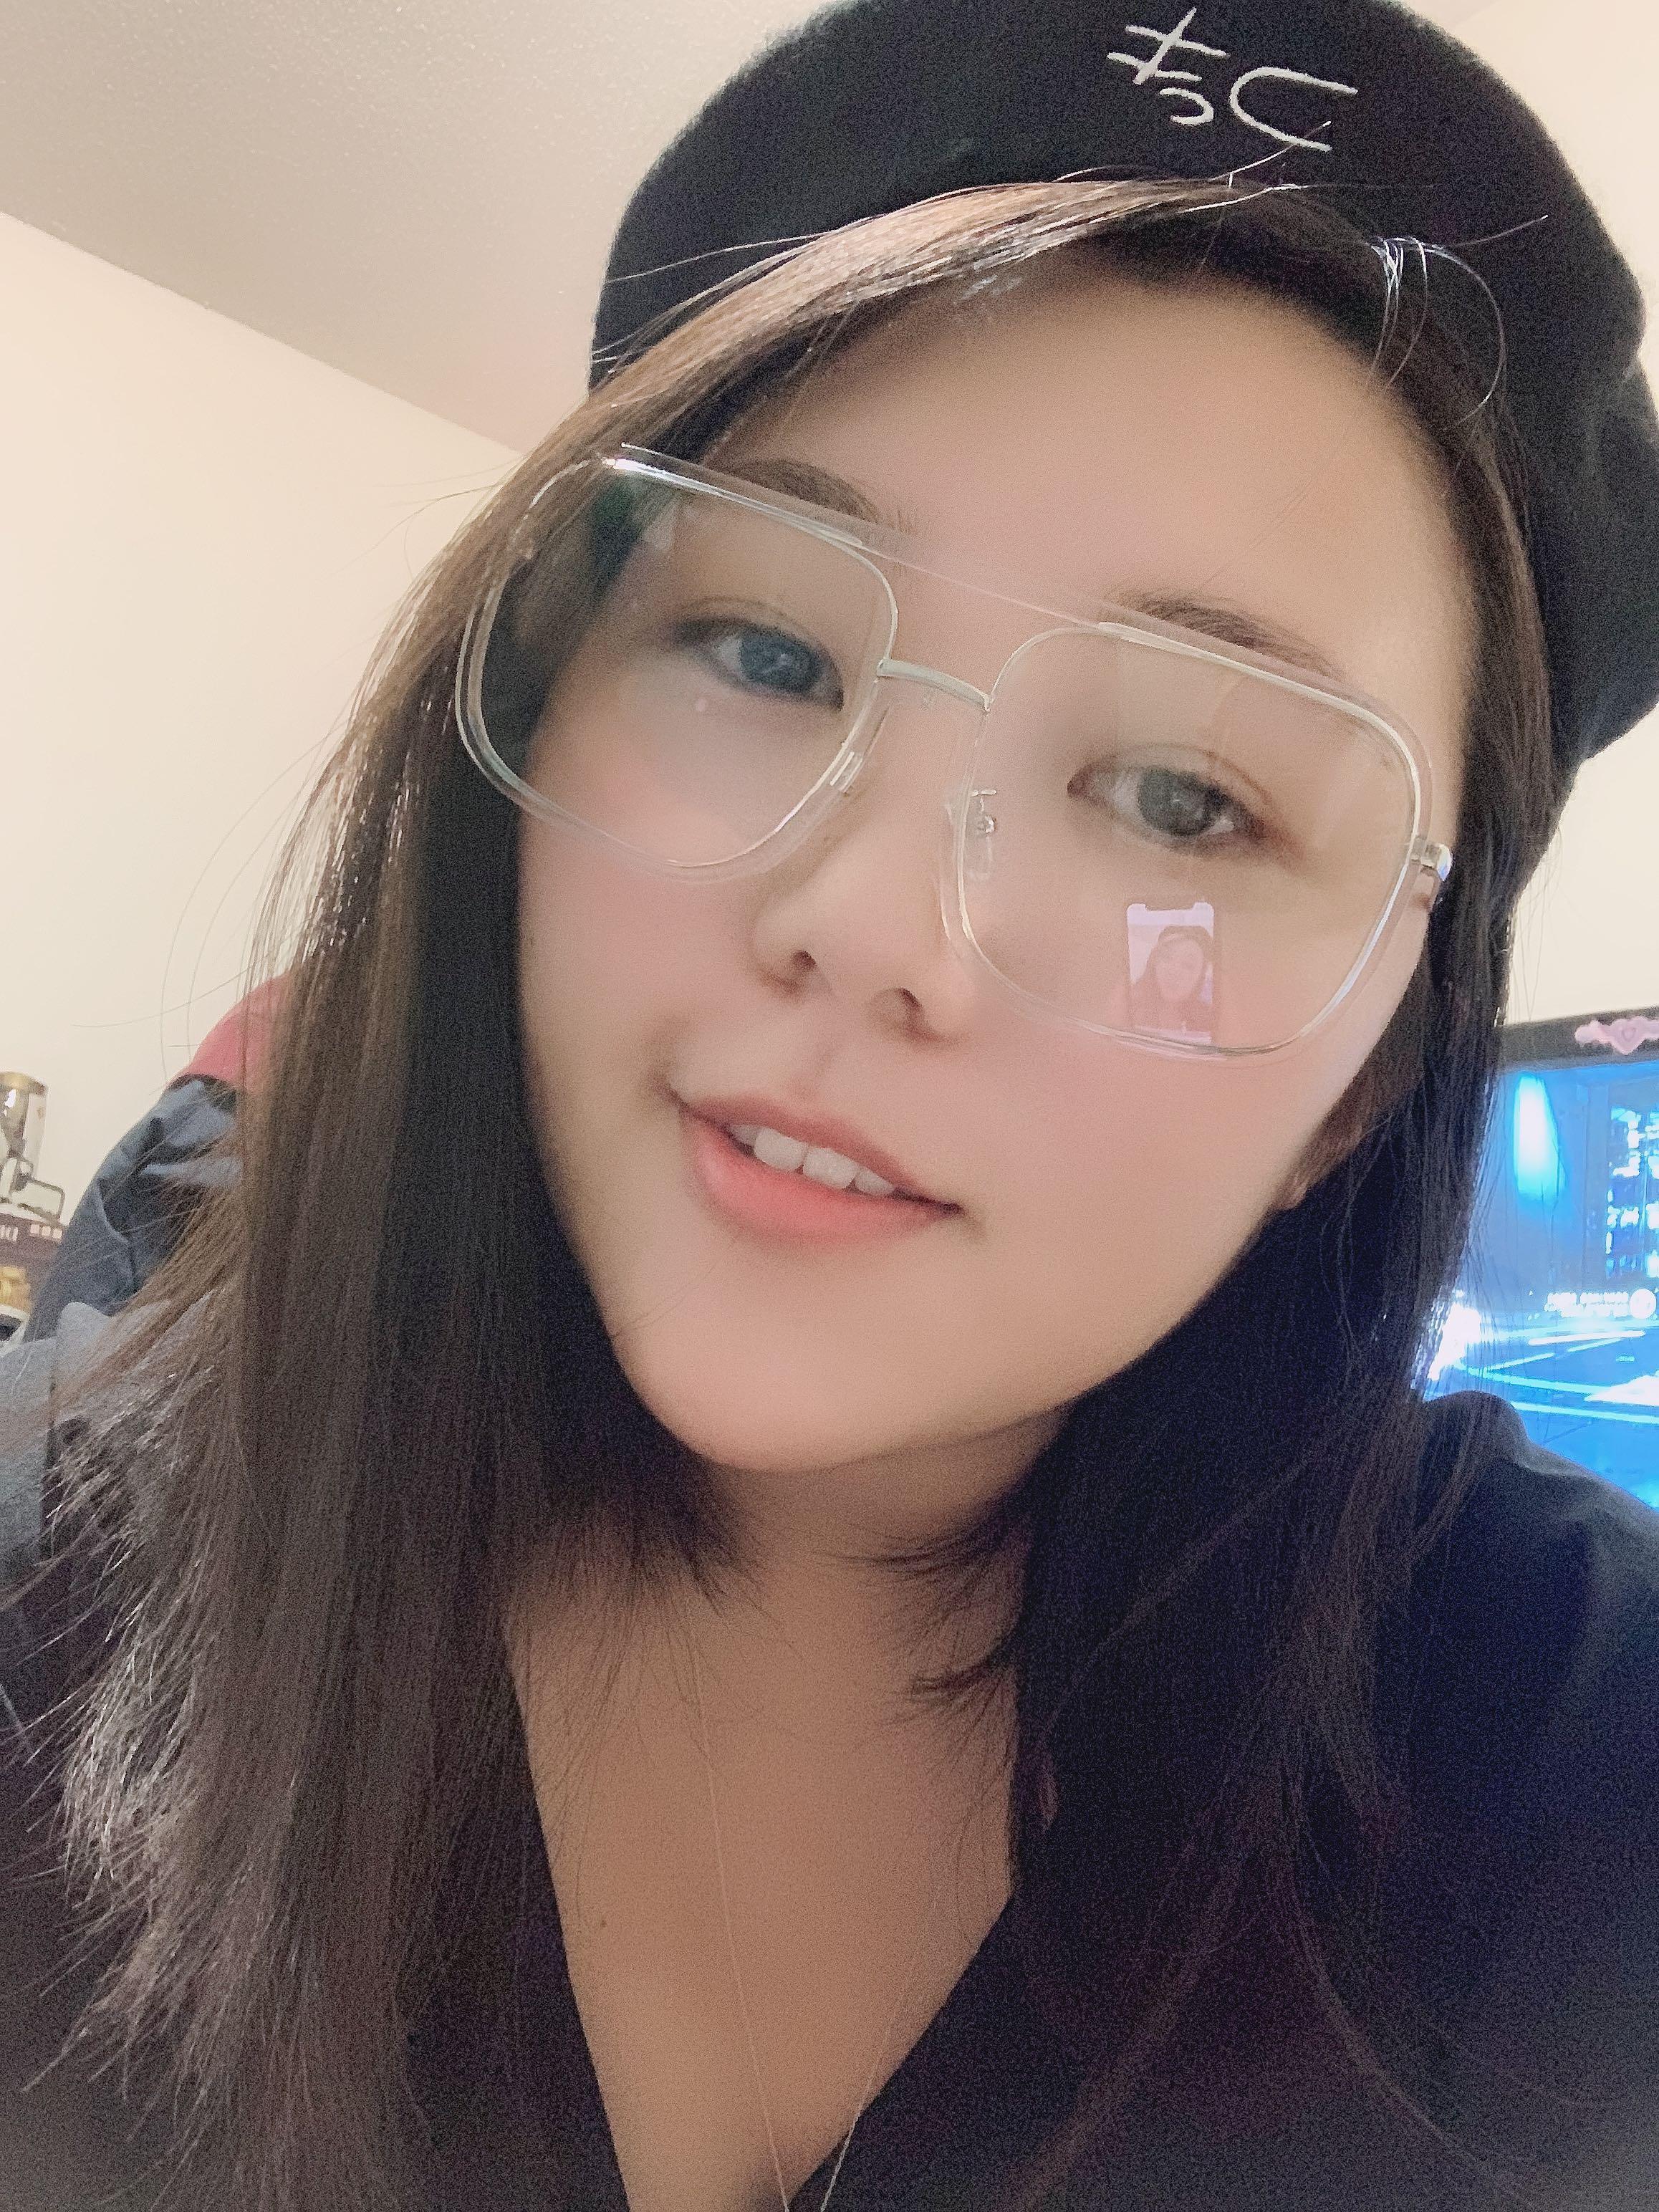 Stylish Clear Frame Glasses (0 degree)